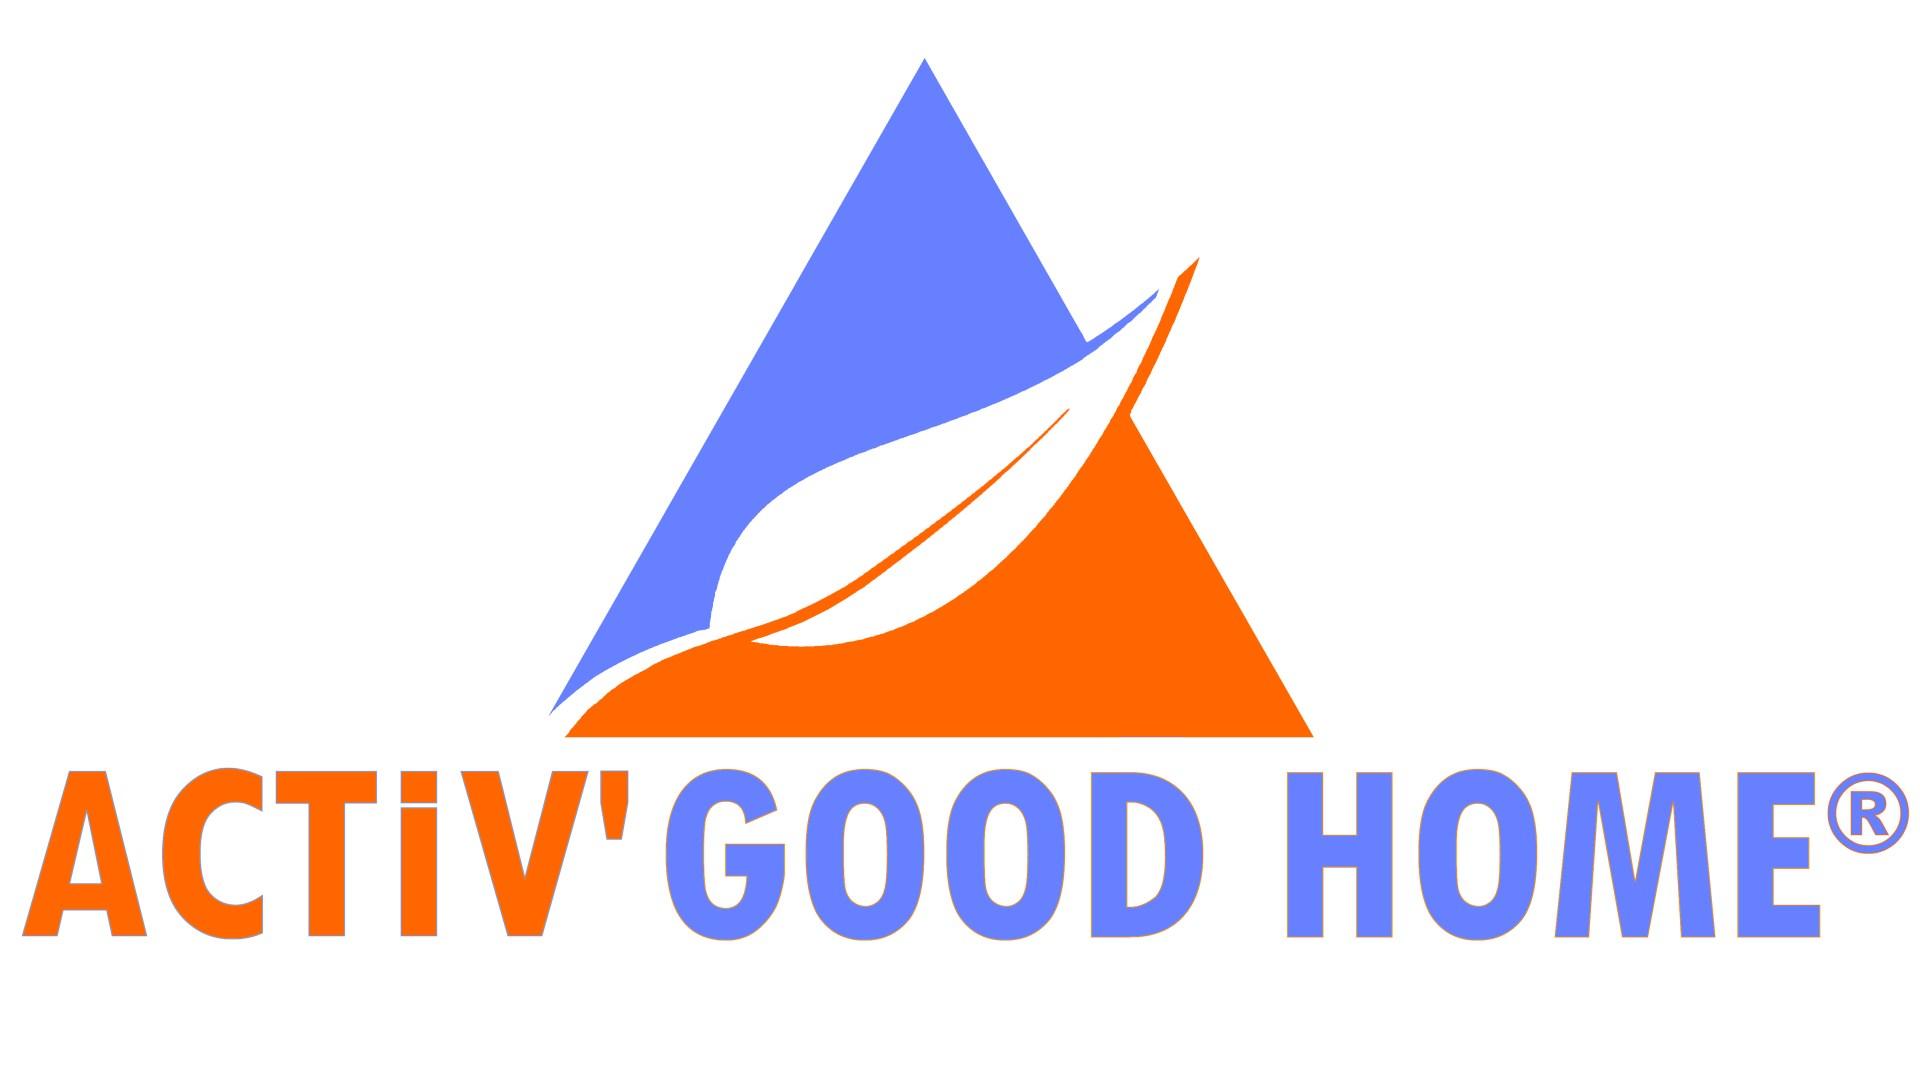 ACTIV GOOD HOME